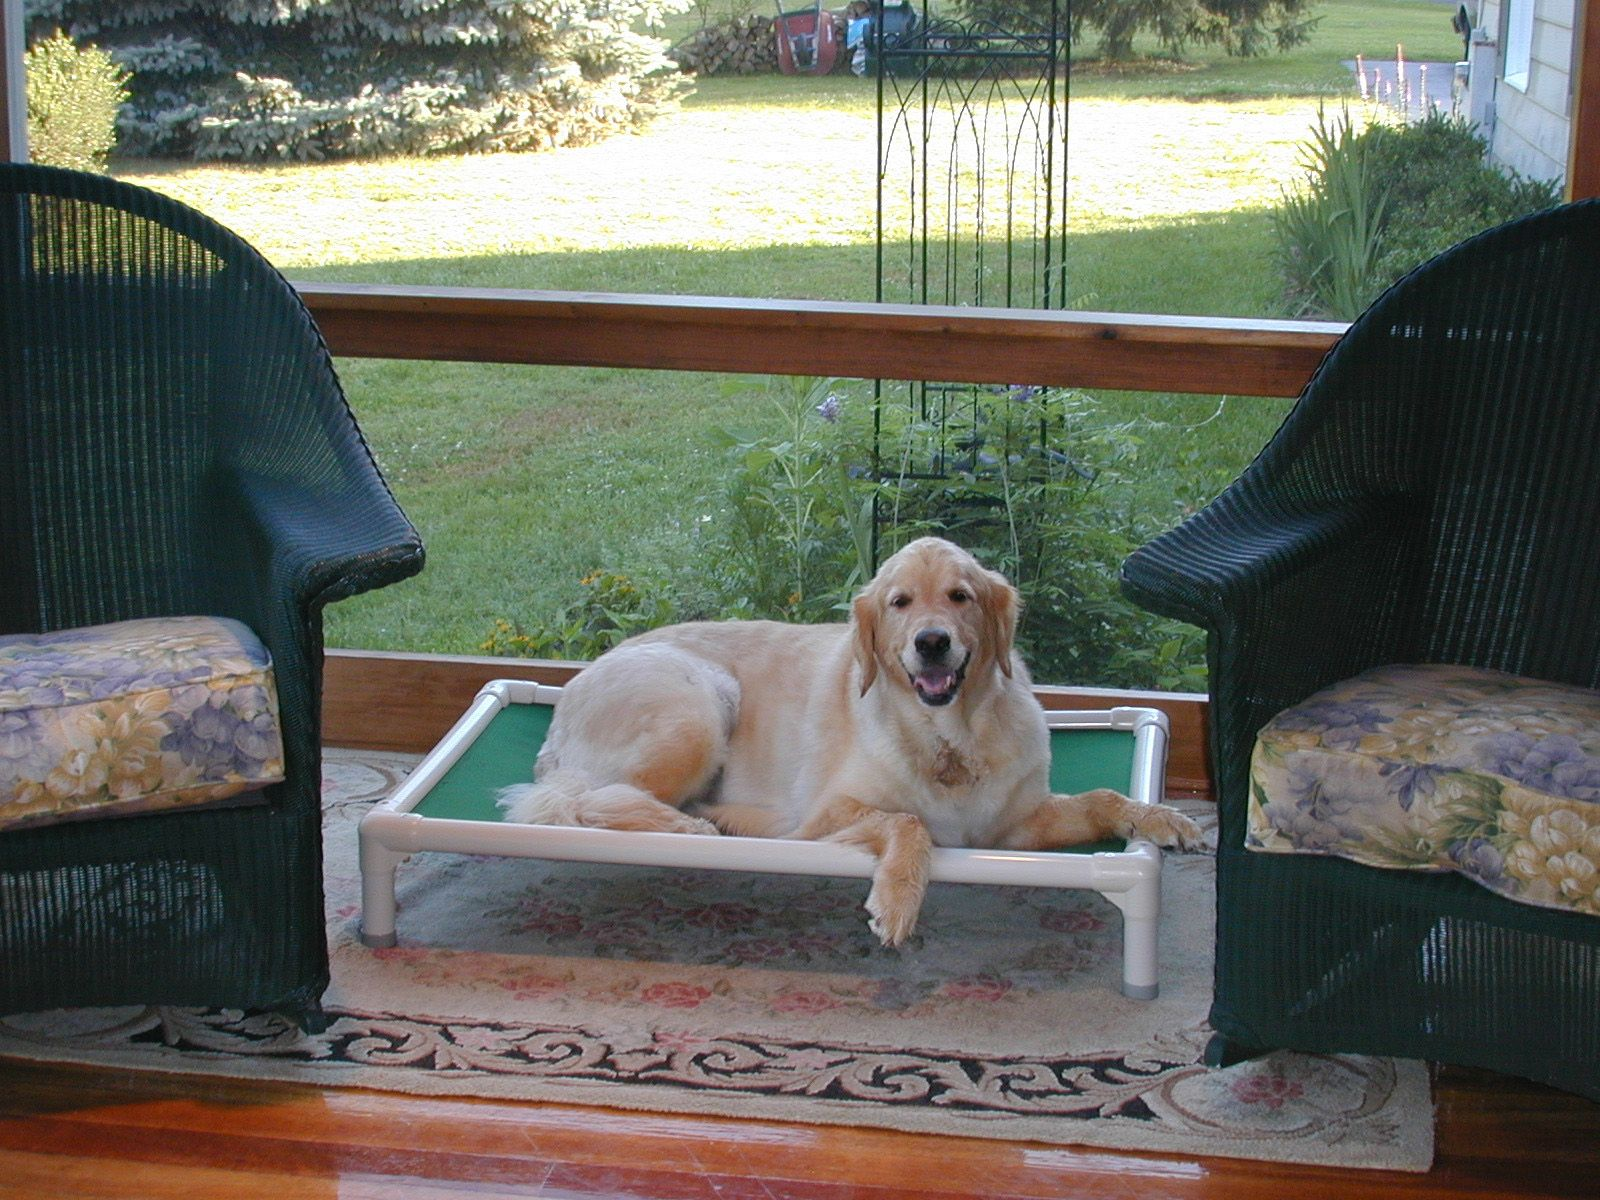 A golden retriever enjoying the breeze on the porch